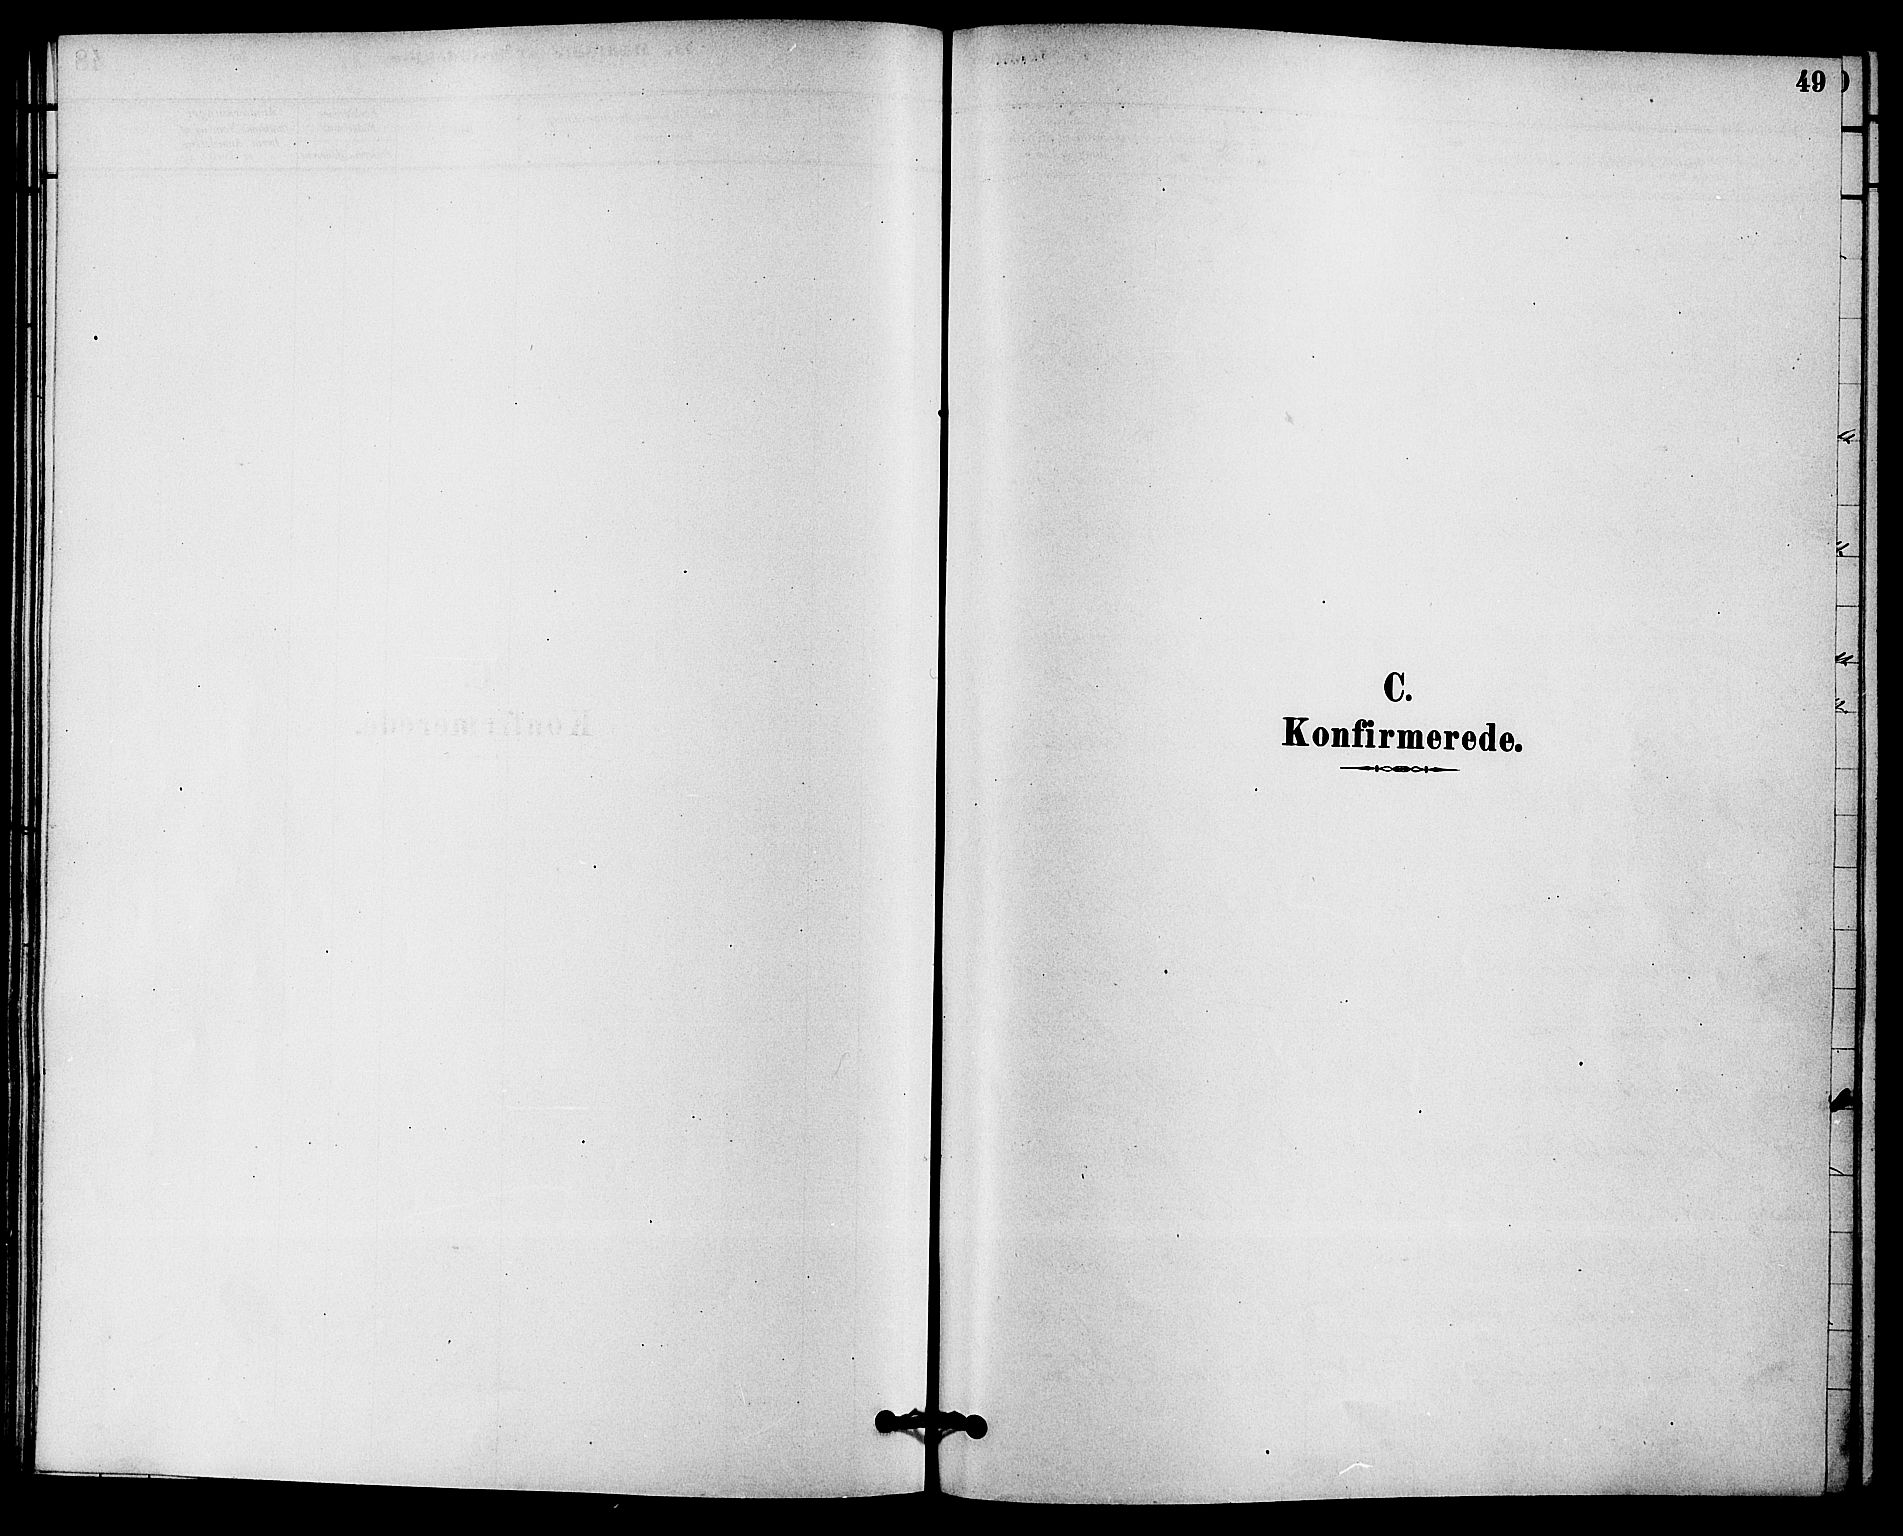 SAKO, Solum kirkebøker, F/Fc/L0001: Ministerialbok nr. III 1, 1877-1891, s. 49